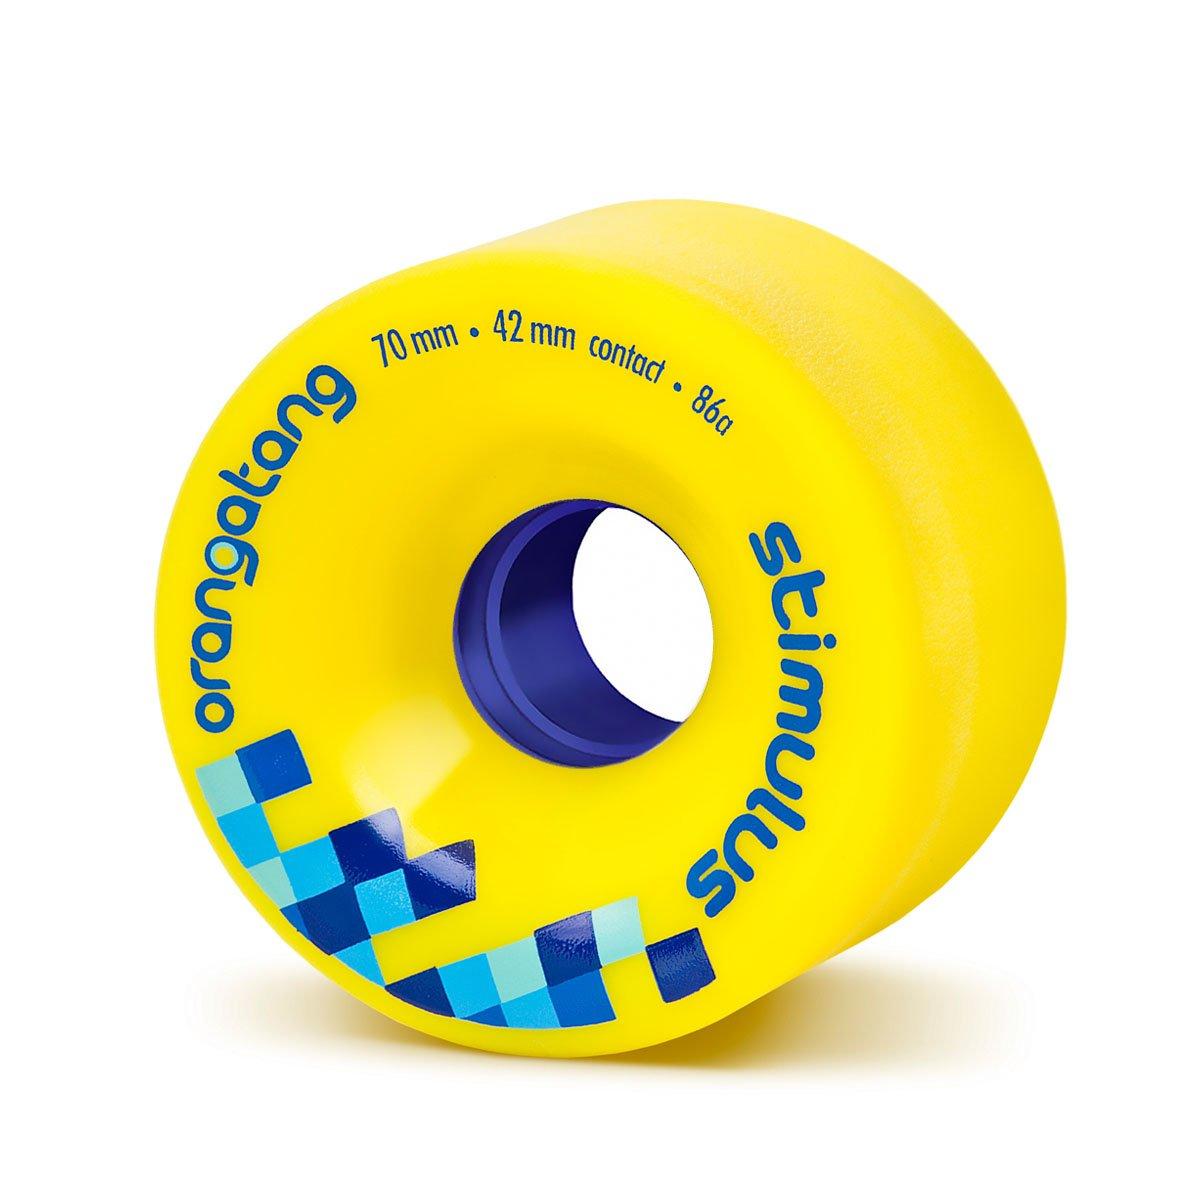 Orangatang Stimulus 70 mm 86a Freeride Longboard Skateboard Wheels w/Loaded Jehu V2 Bearings (Yellow, Set of 4) by Orangatang